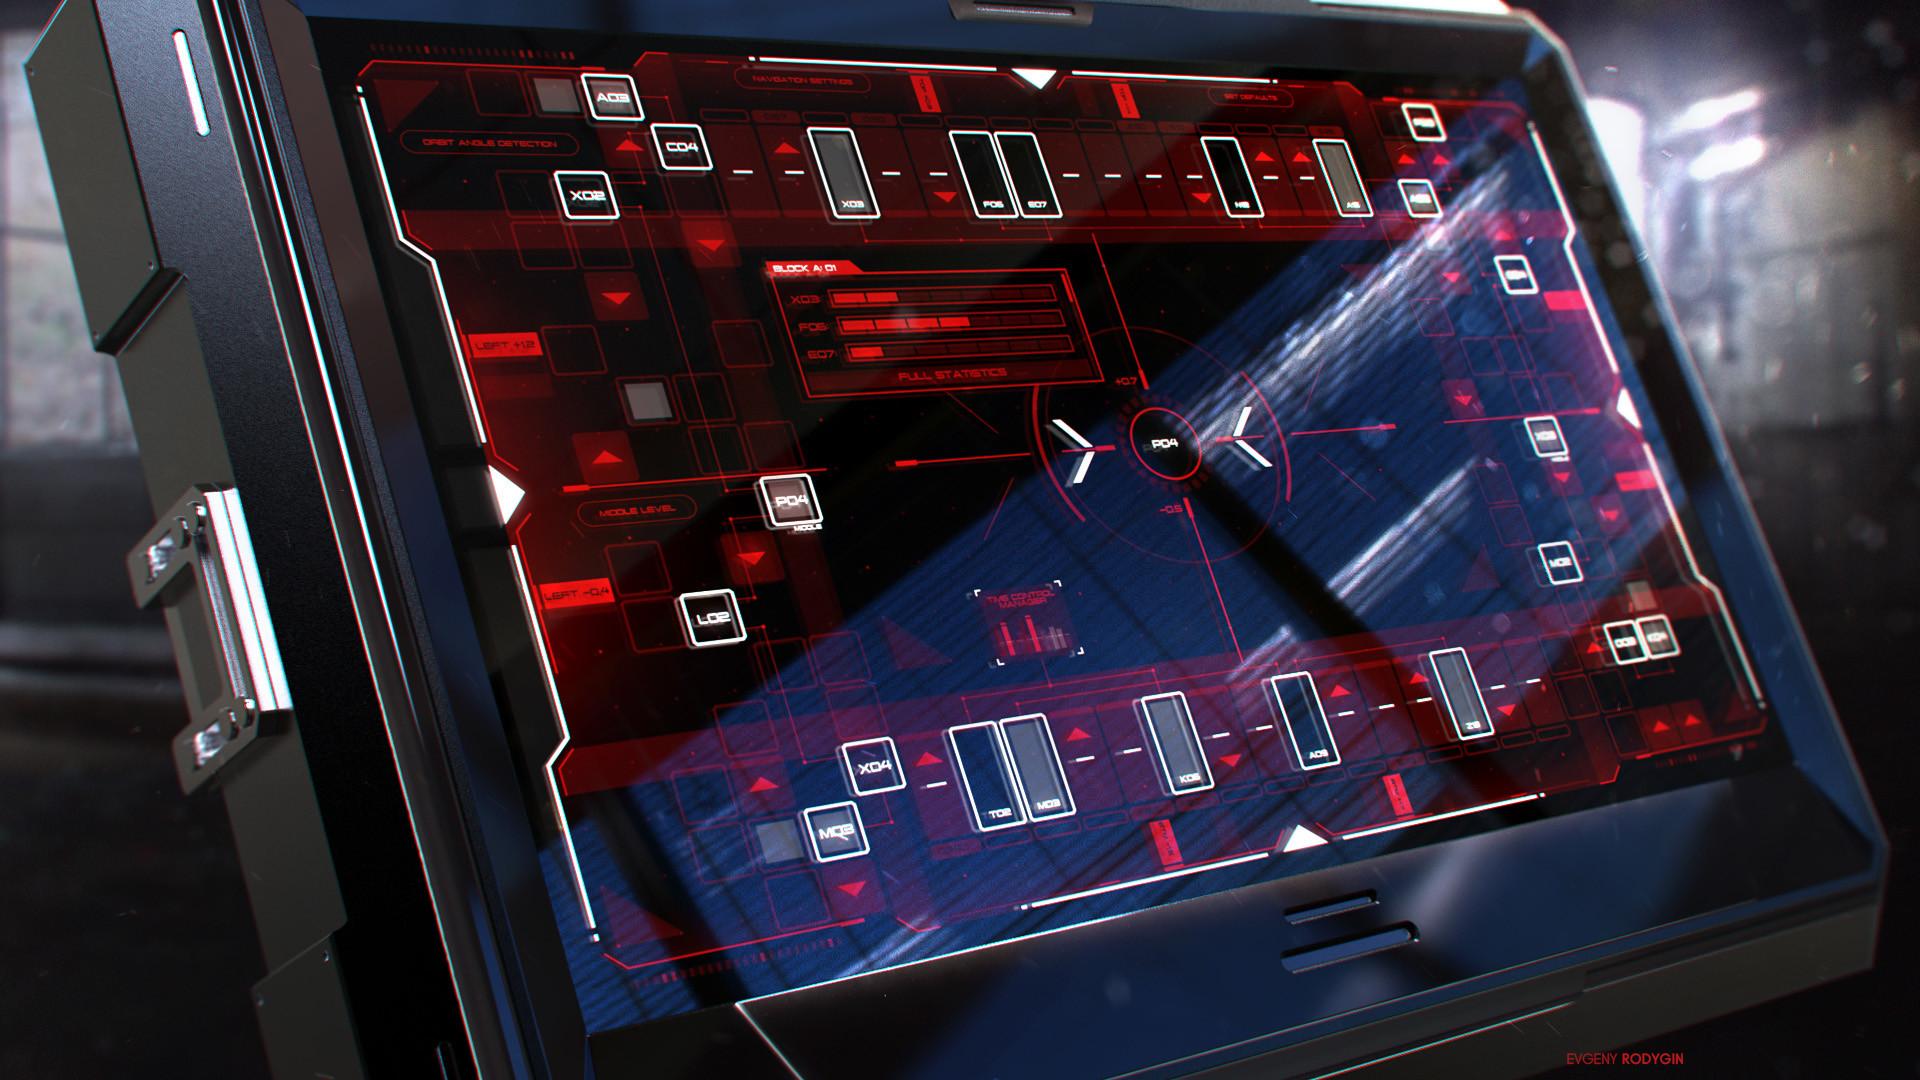 Control Screen Interface FUI